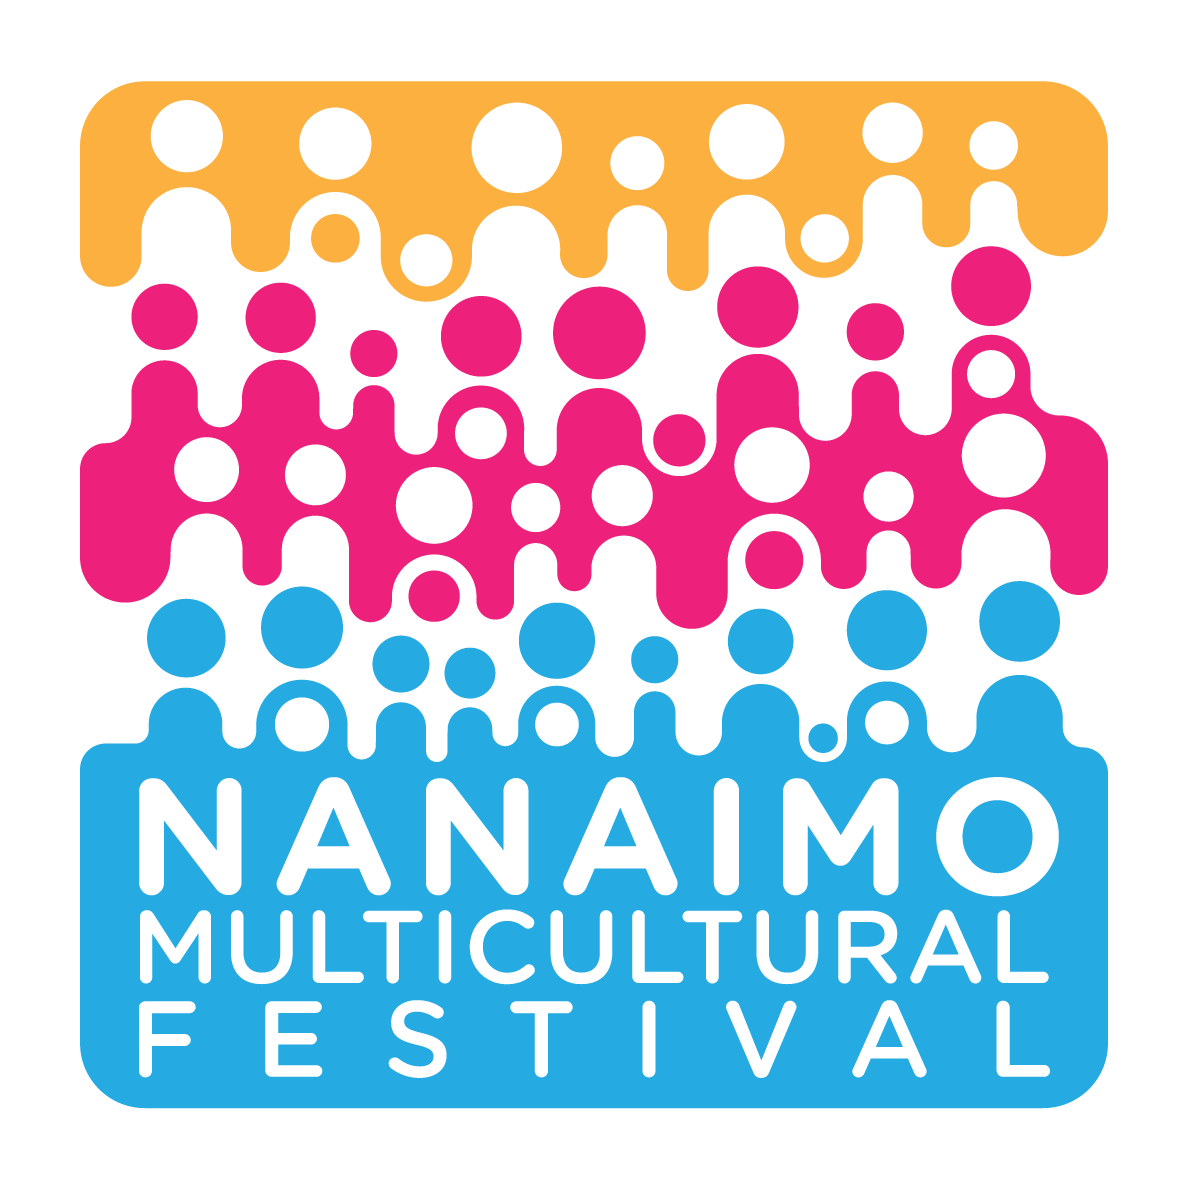 Multicultural-Logo-Brand.png